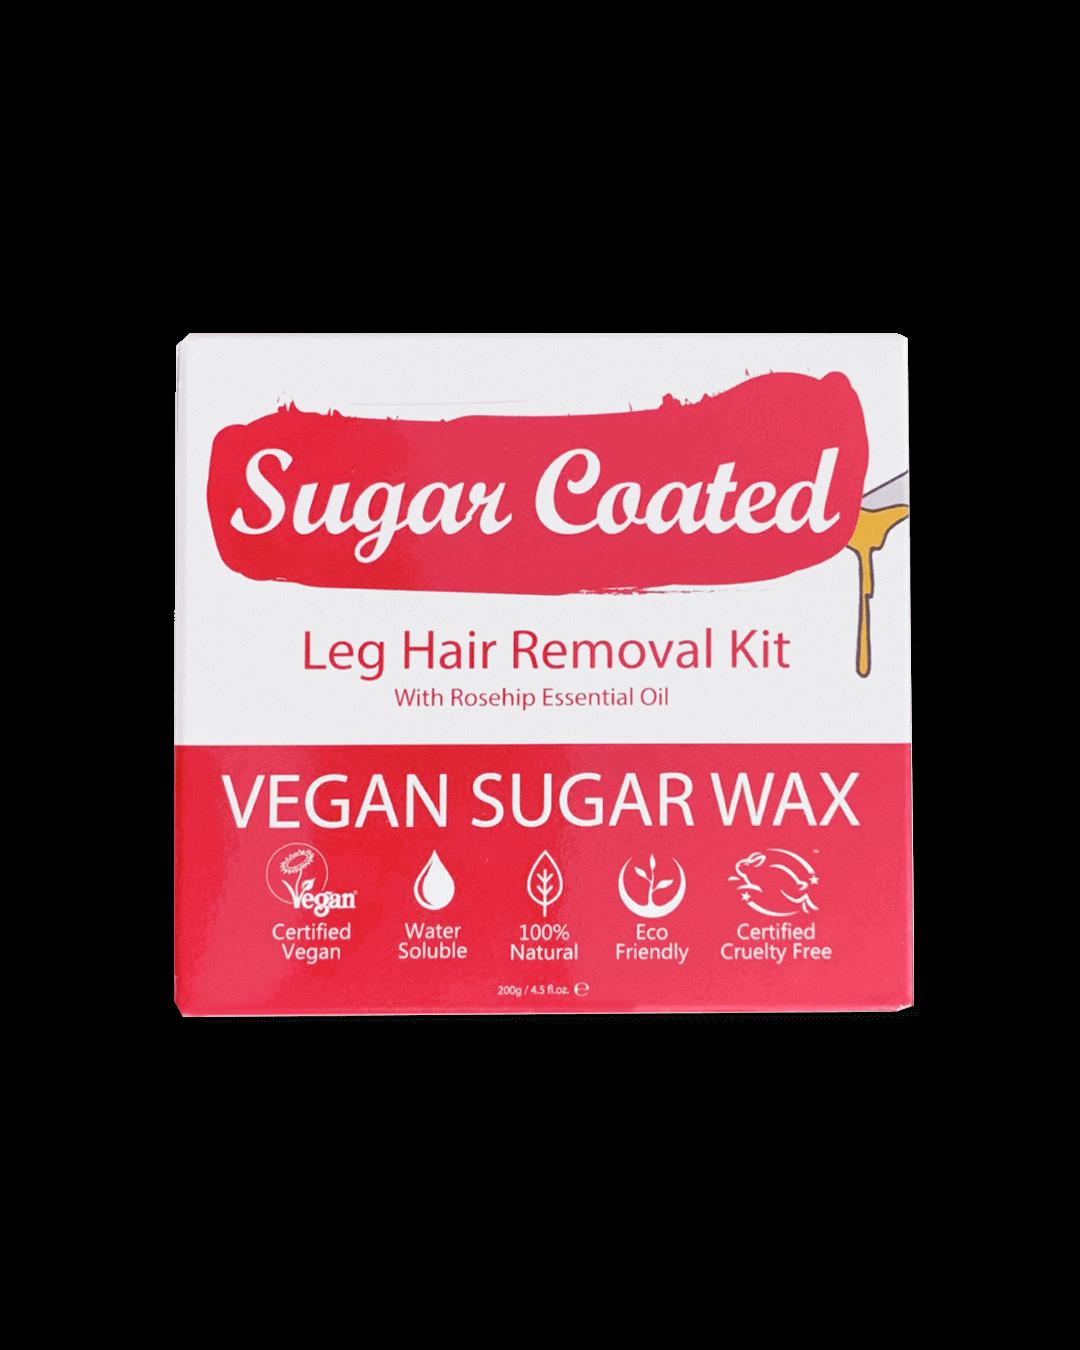 Leg Hair Removal Kit